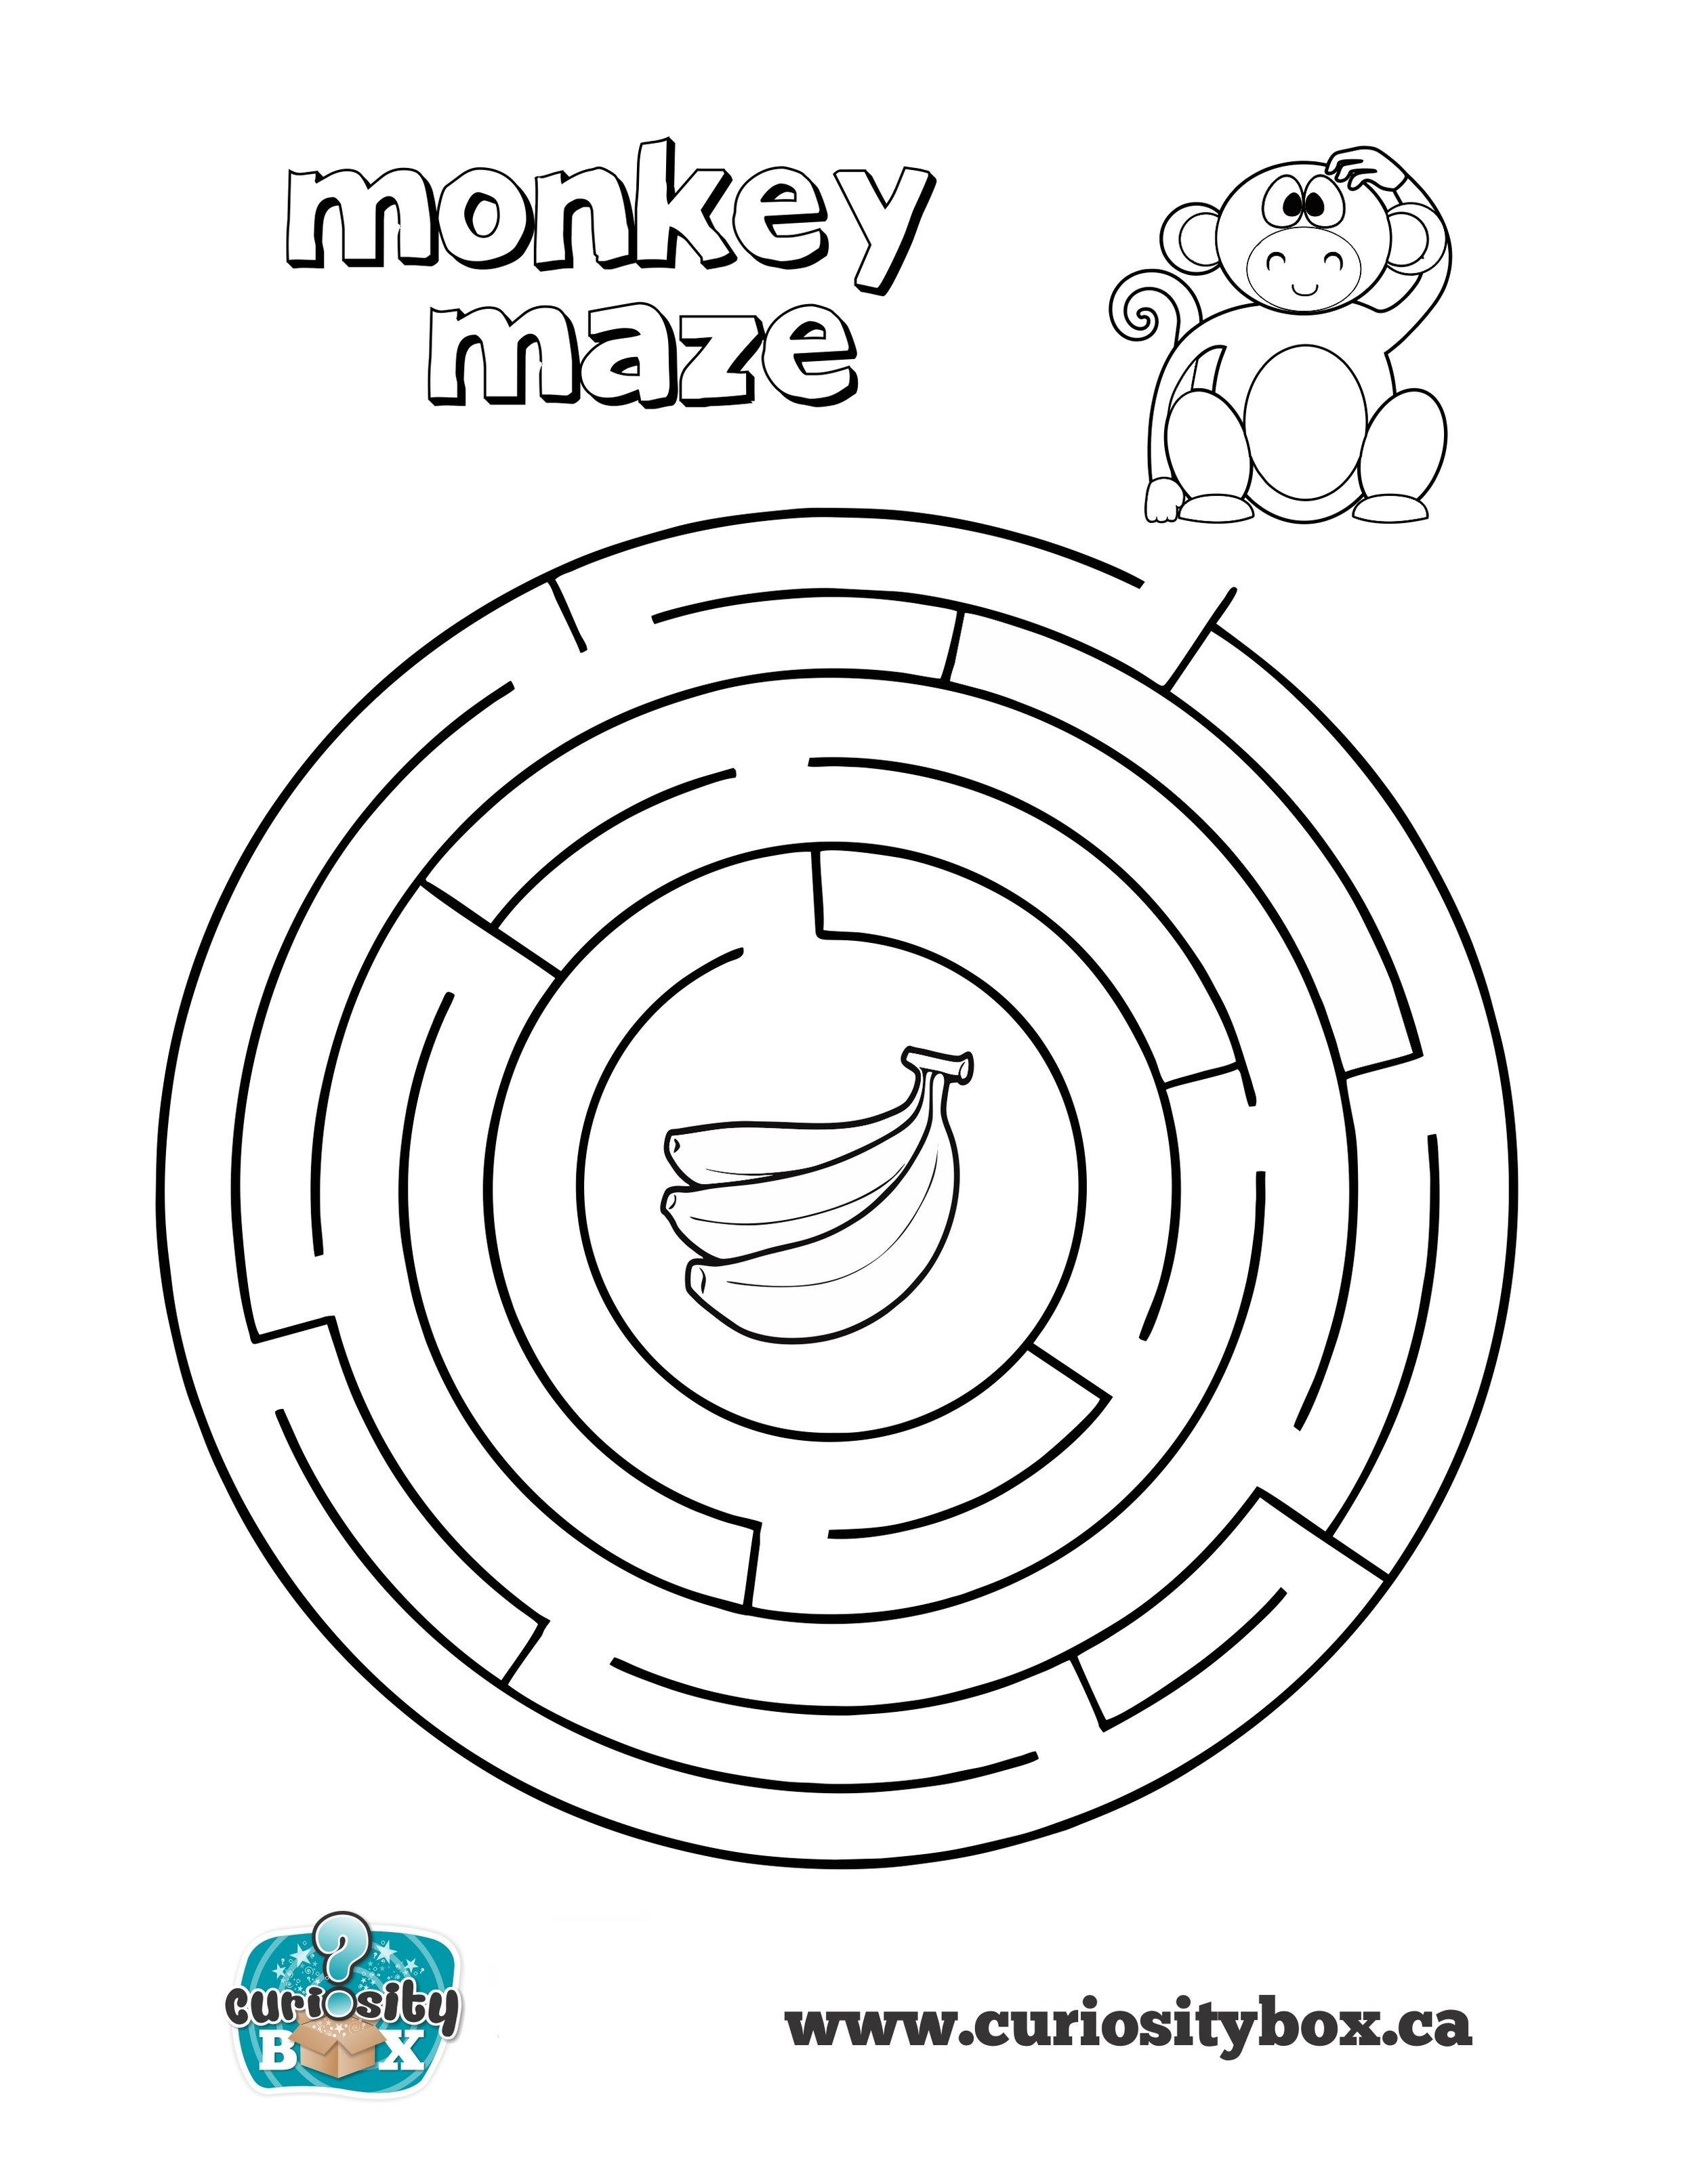 monkey_maze.jpg